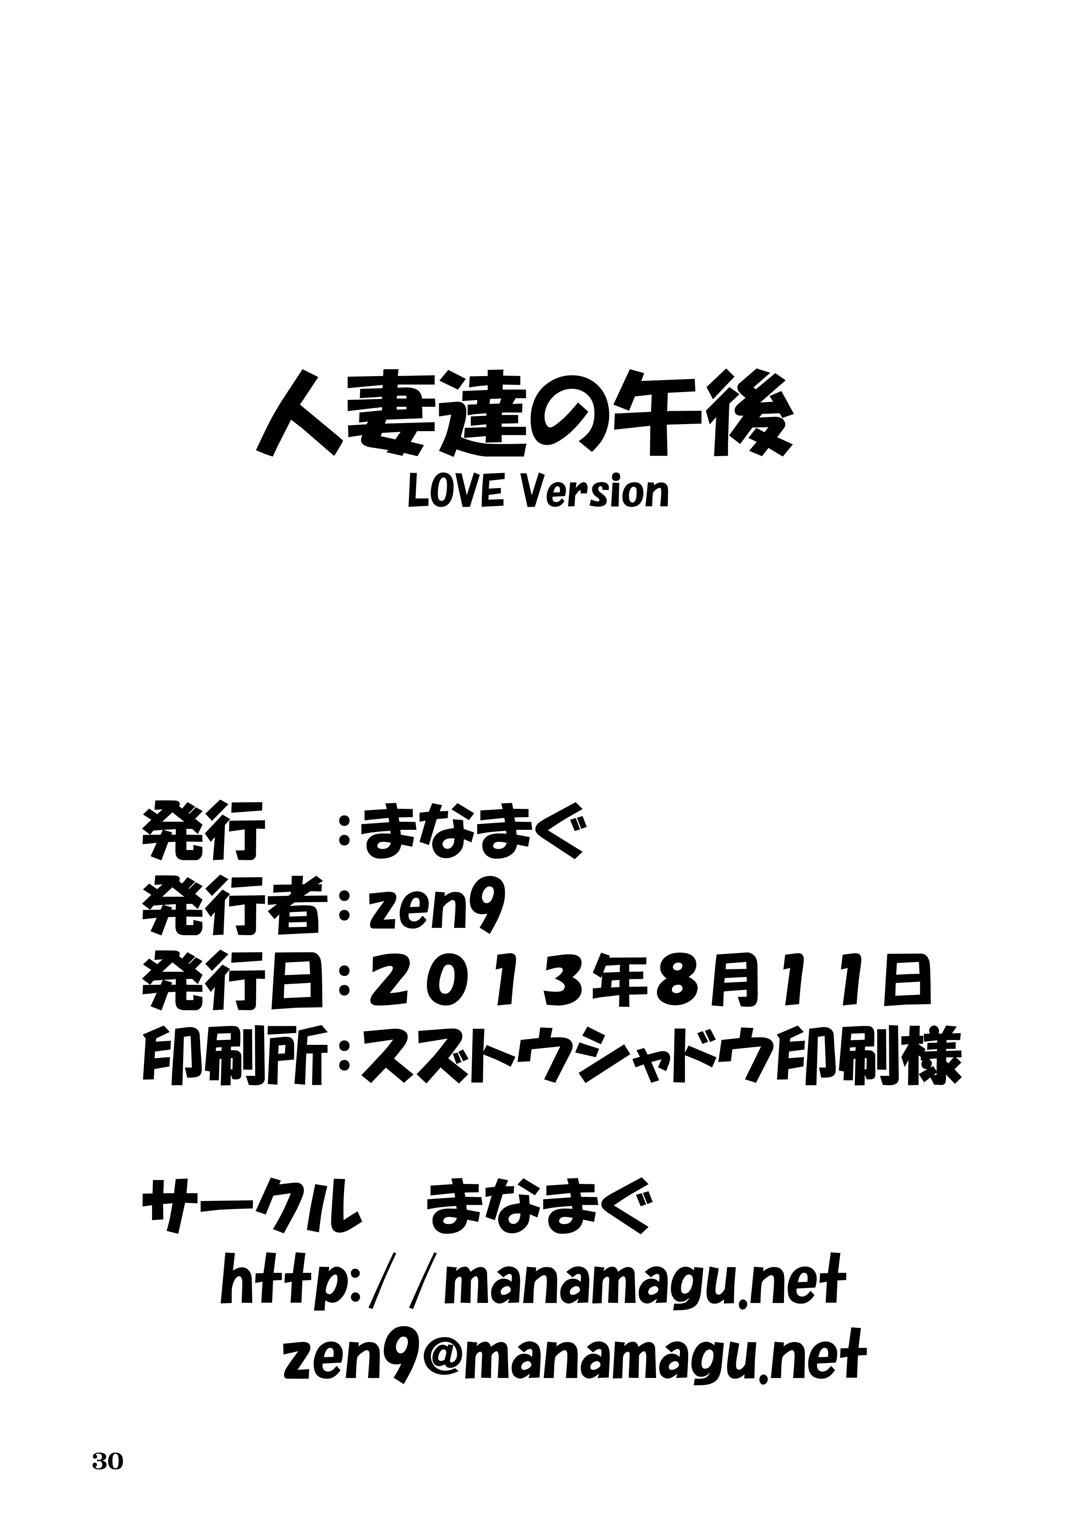 [Manamagu (zen9)] Hitozuma-tachi no Gogo - LOVE Version   Afternoon of Housewives - LOVE Version (Various) [English] {doujin-moe.us} [Digital] 28